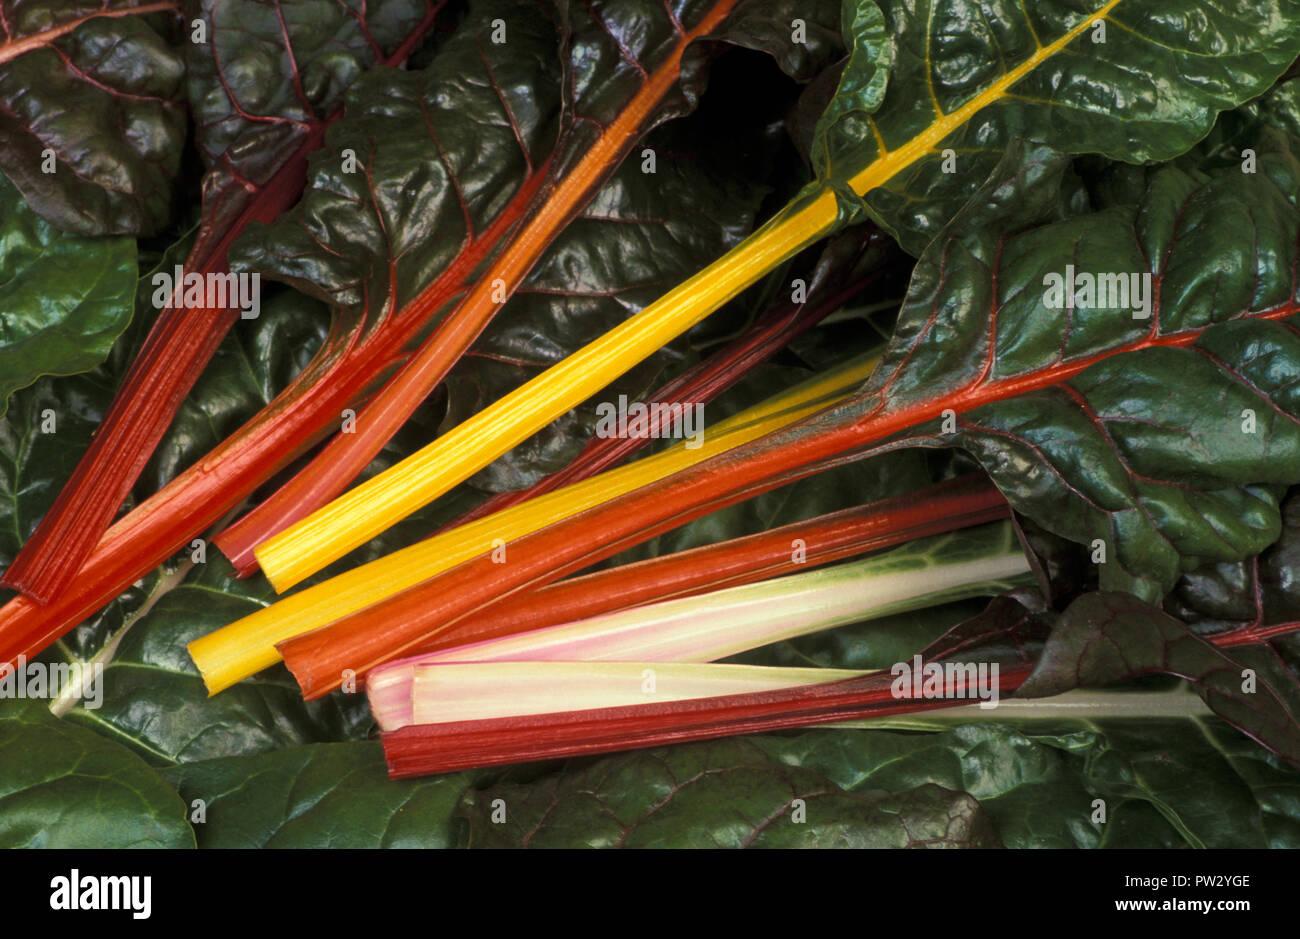 RAINBOW CHARD (SILVERBEET) BETA VULGARIS SSP. CICLA. - Stock Image